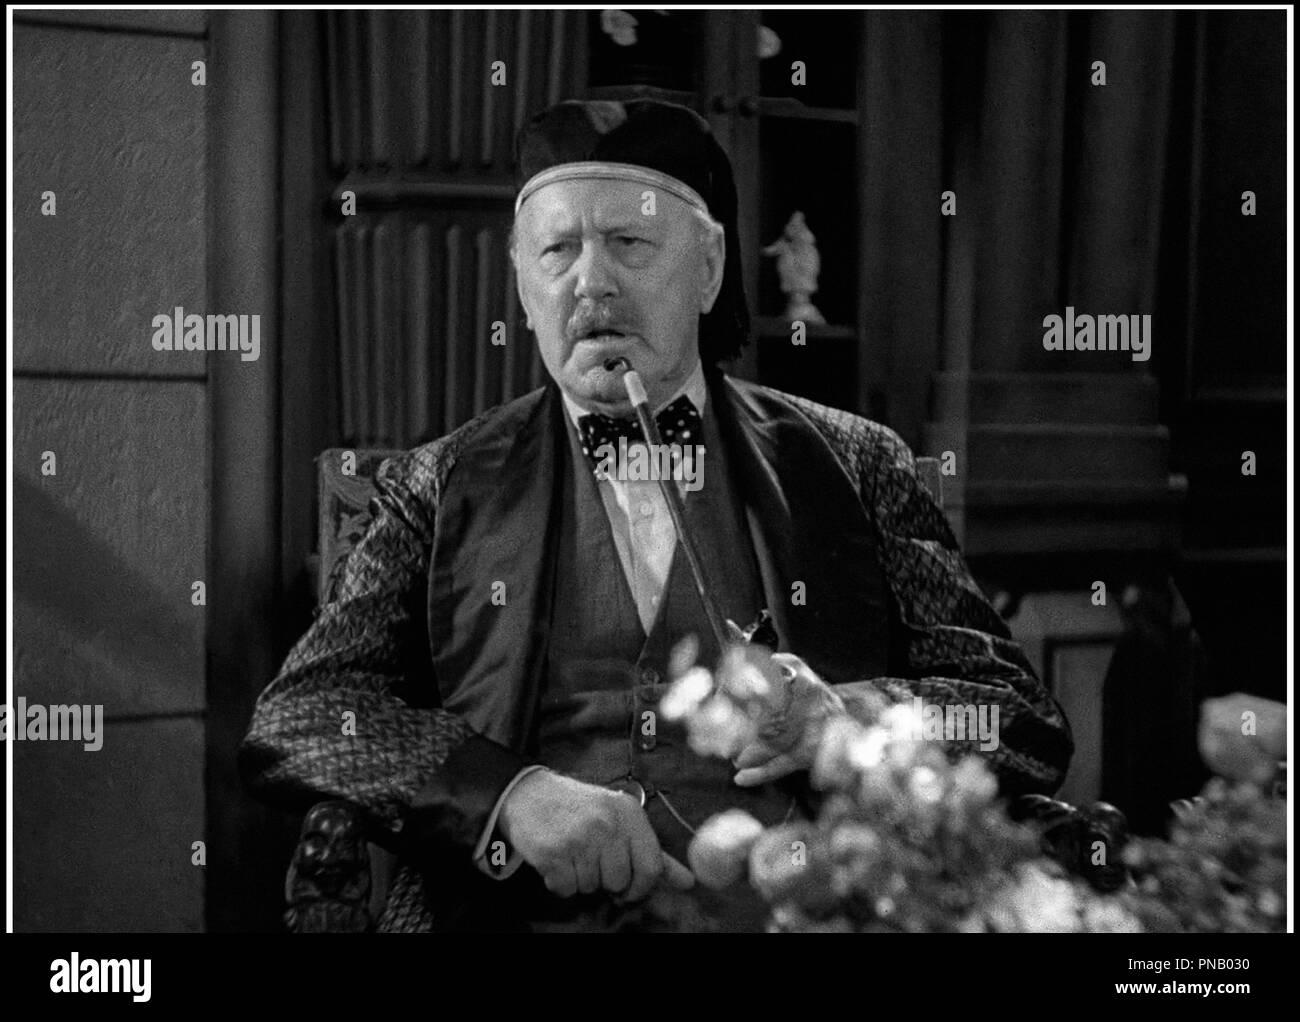 Prod DB © Universal / Dr. Frankenstein de James Whale de 1931 EEUU ...